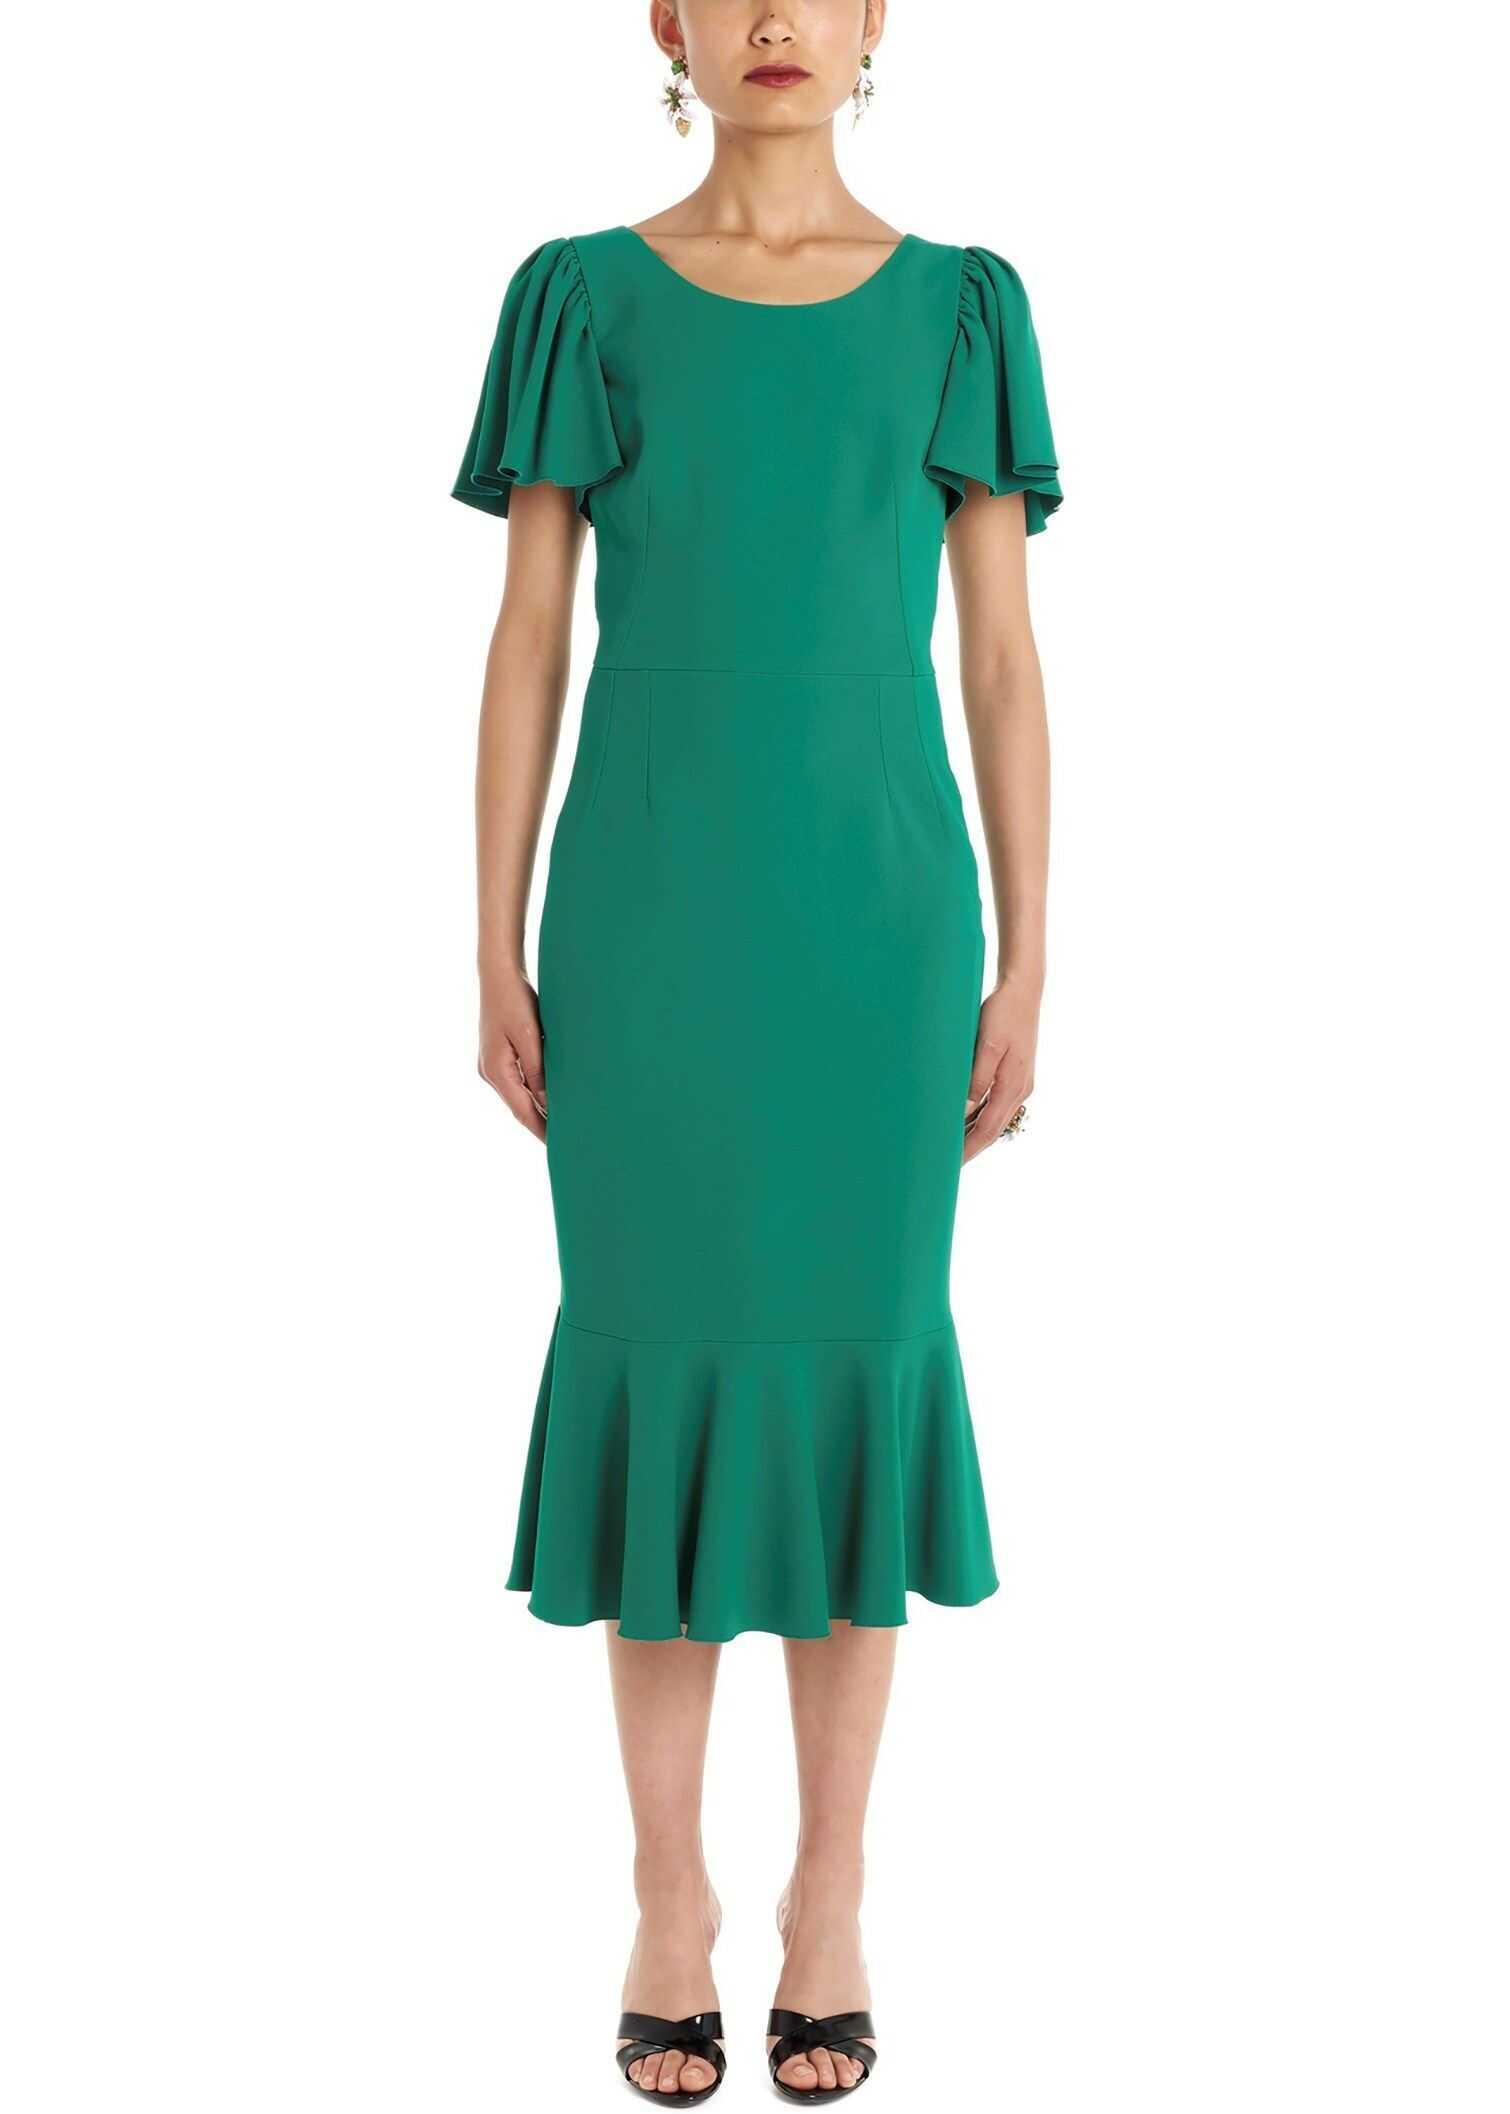 Dolce & Gabbana Viscose Dress GREEN